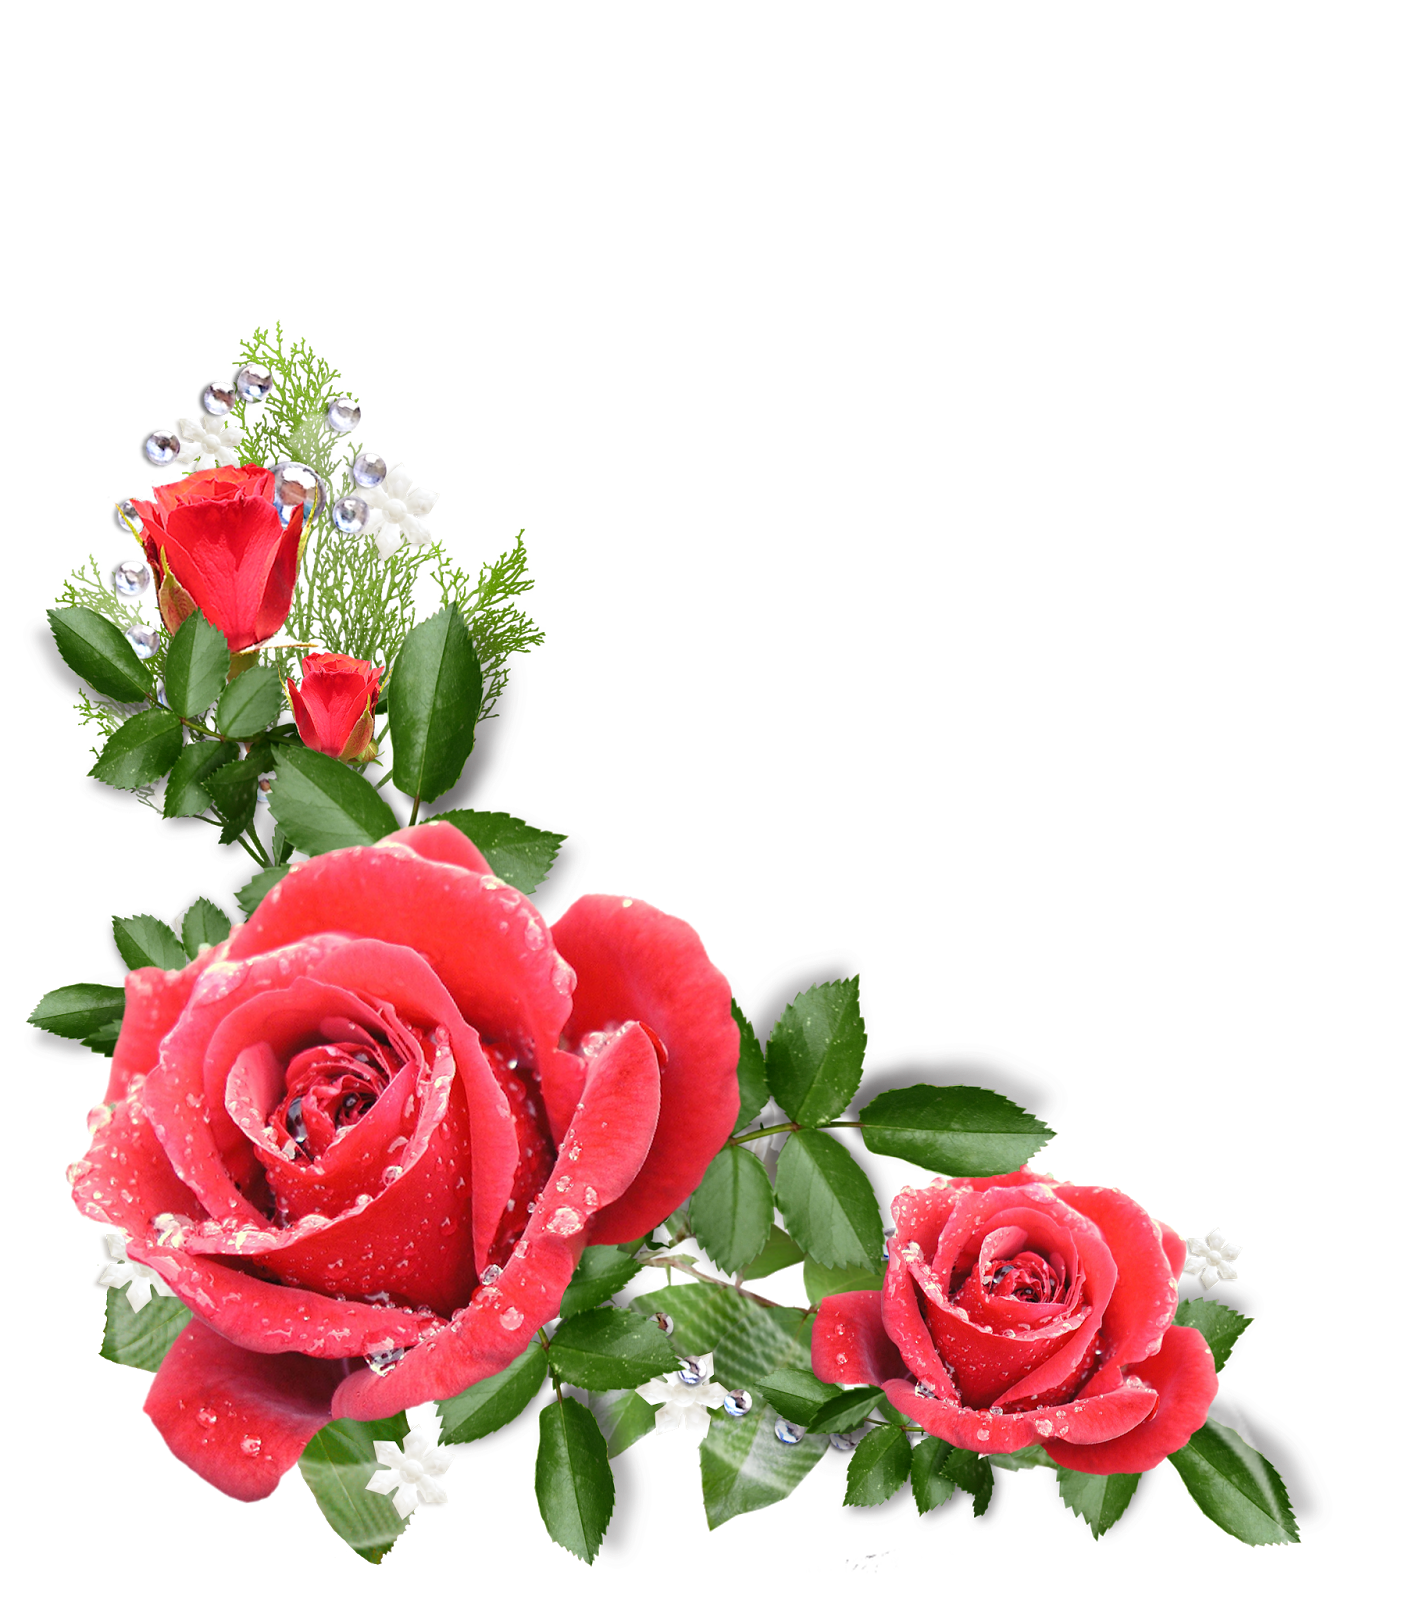 Imagenes para decorar hojas blancas publicado por for Dibujos para decorar